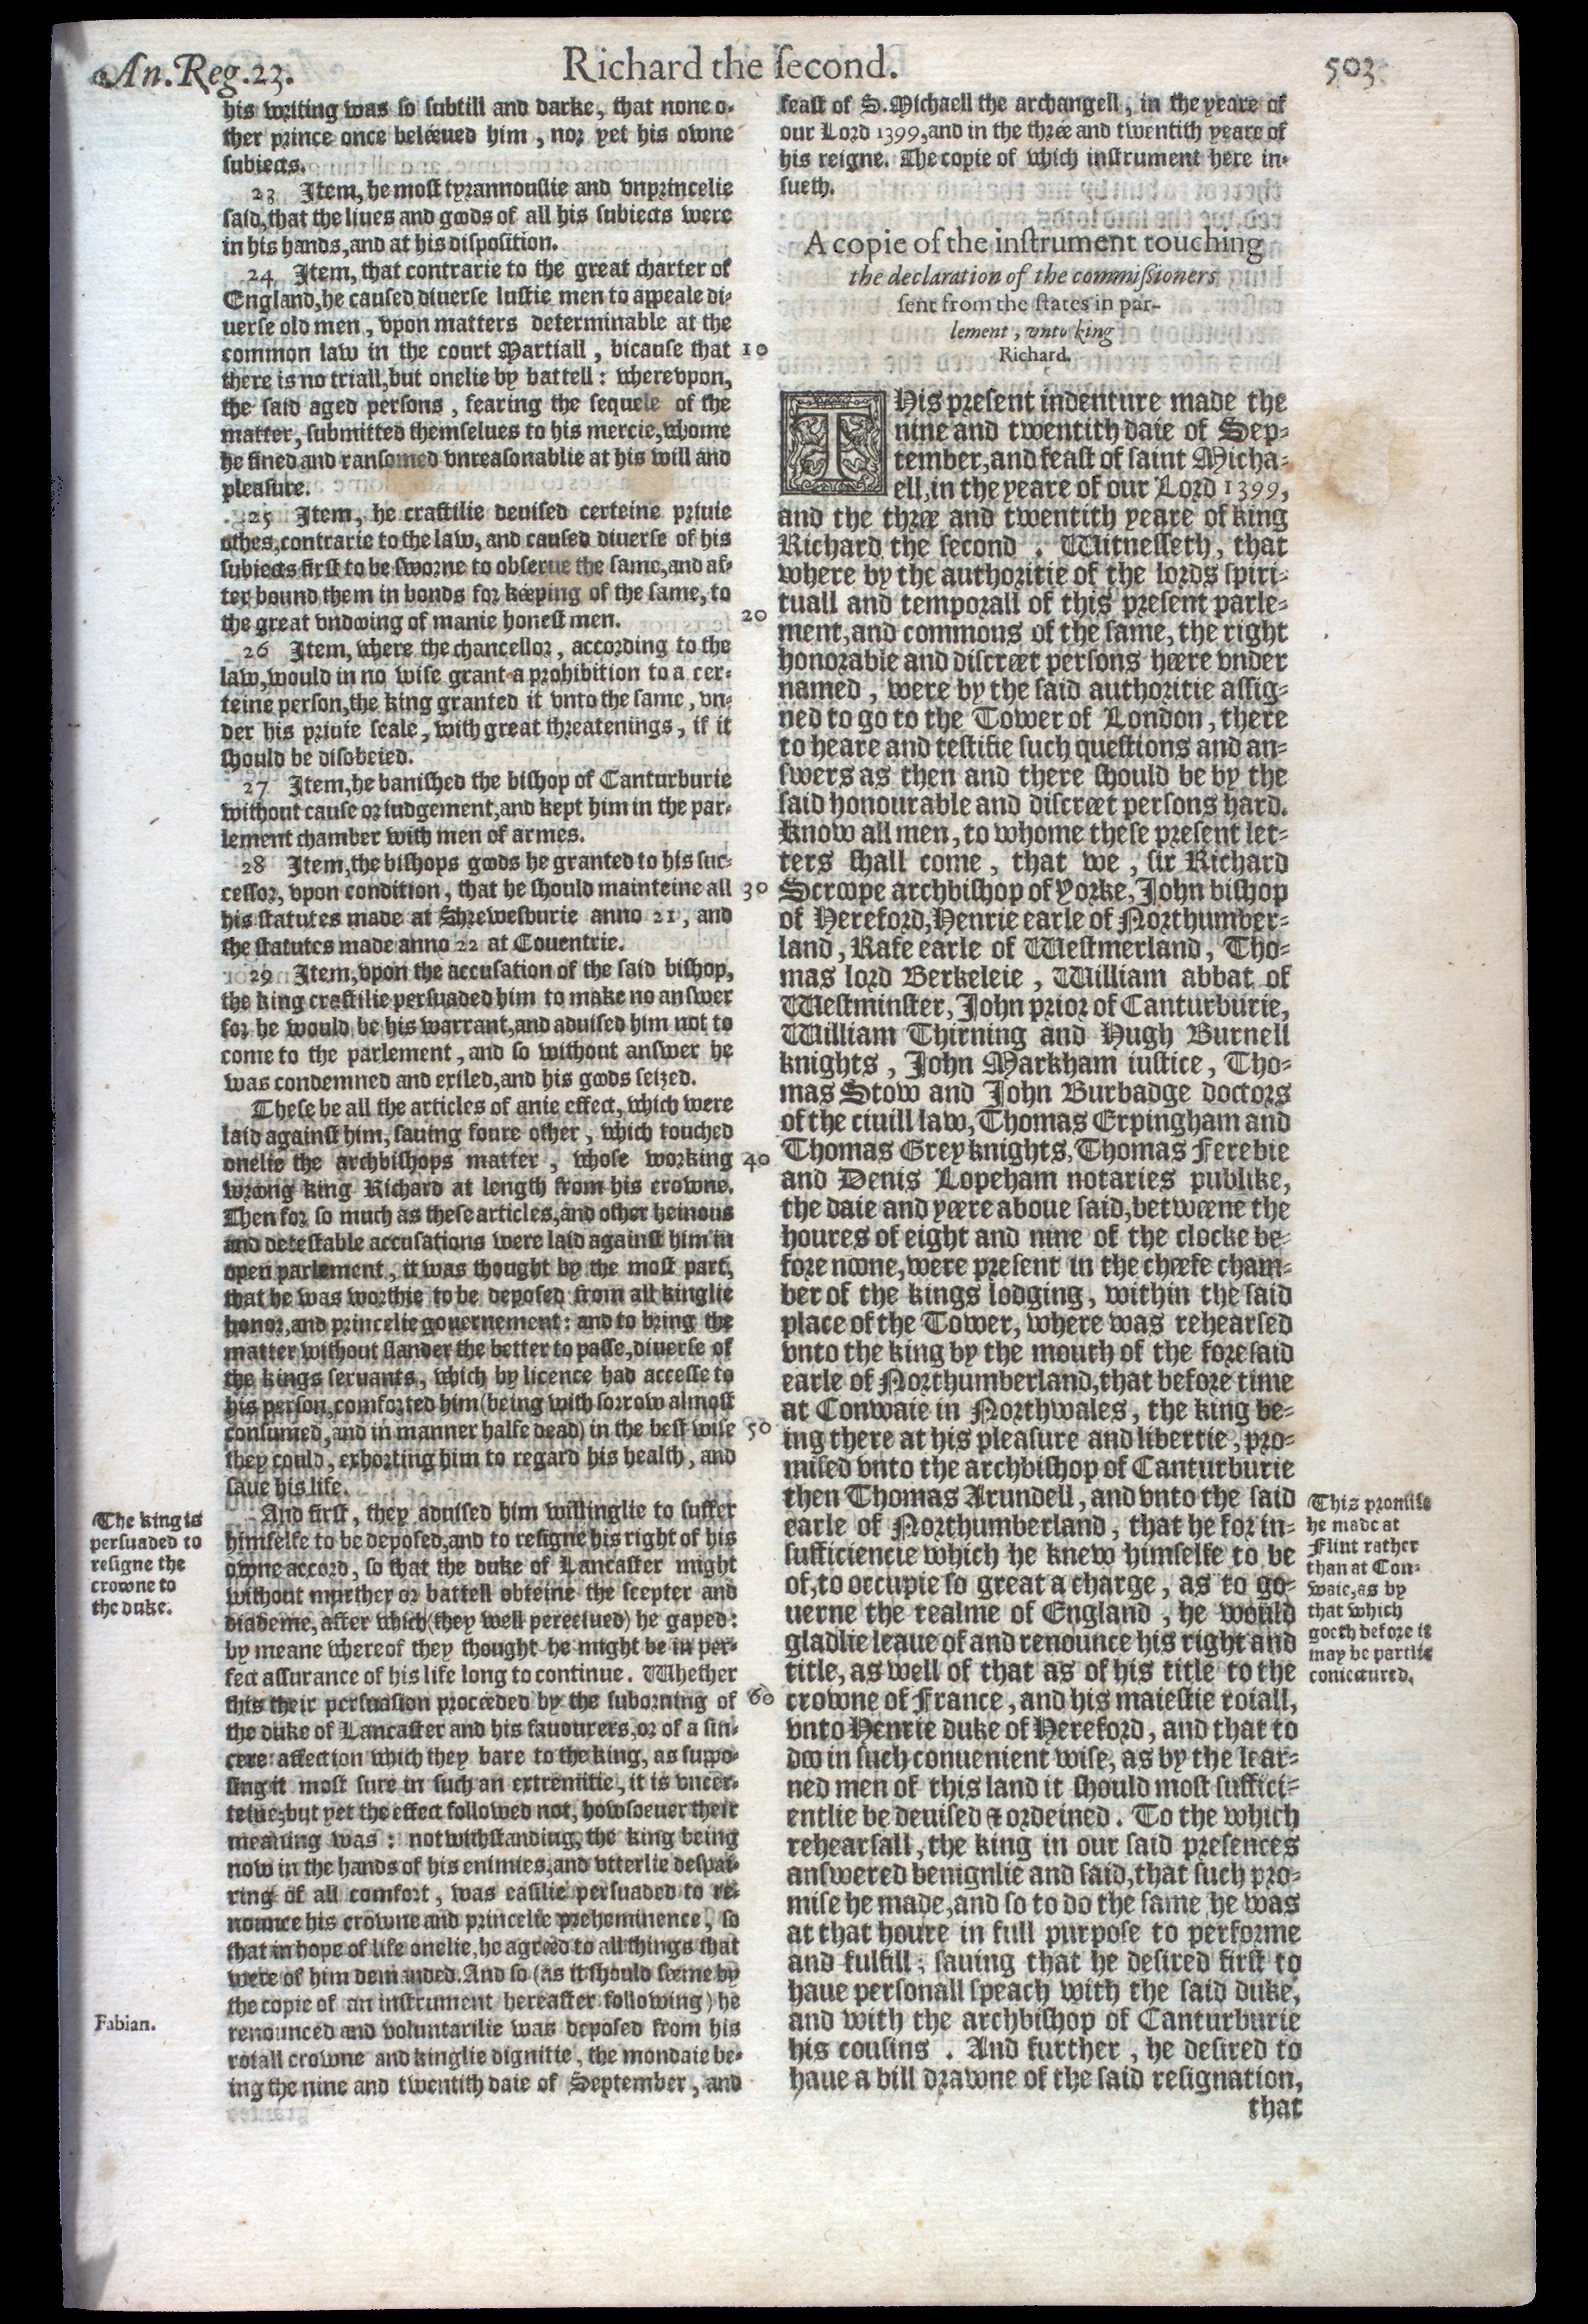 1740 scotland - File The Chronicles Of England Scotland And Ireland Holinshed 1587 1740